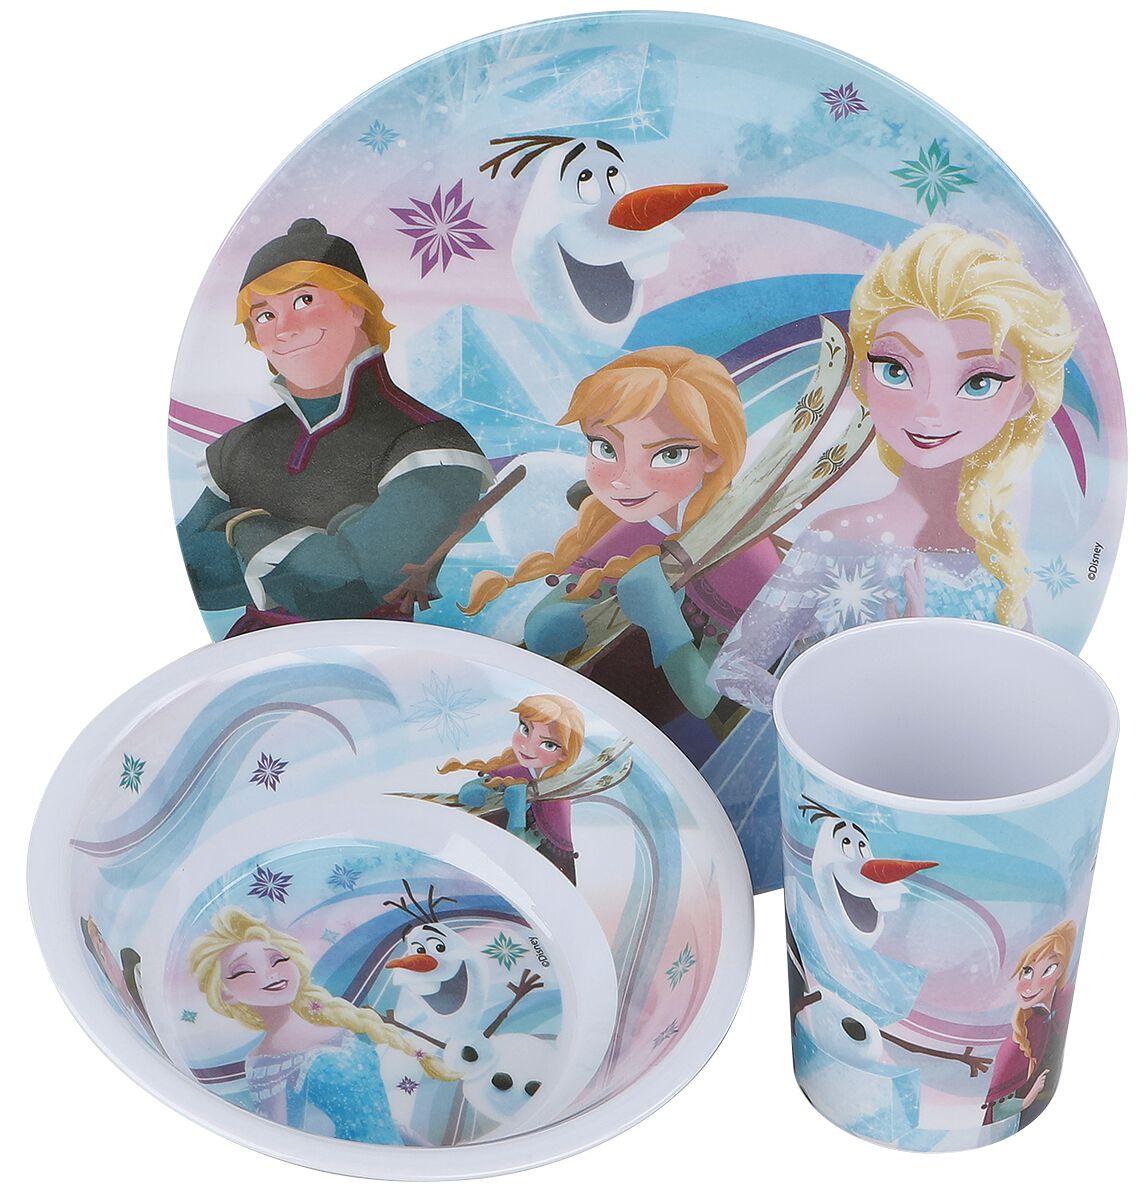 Die Eiskönigin Frühstücksset Frühstücks-Set multicolor 23873